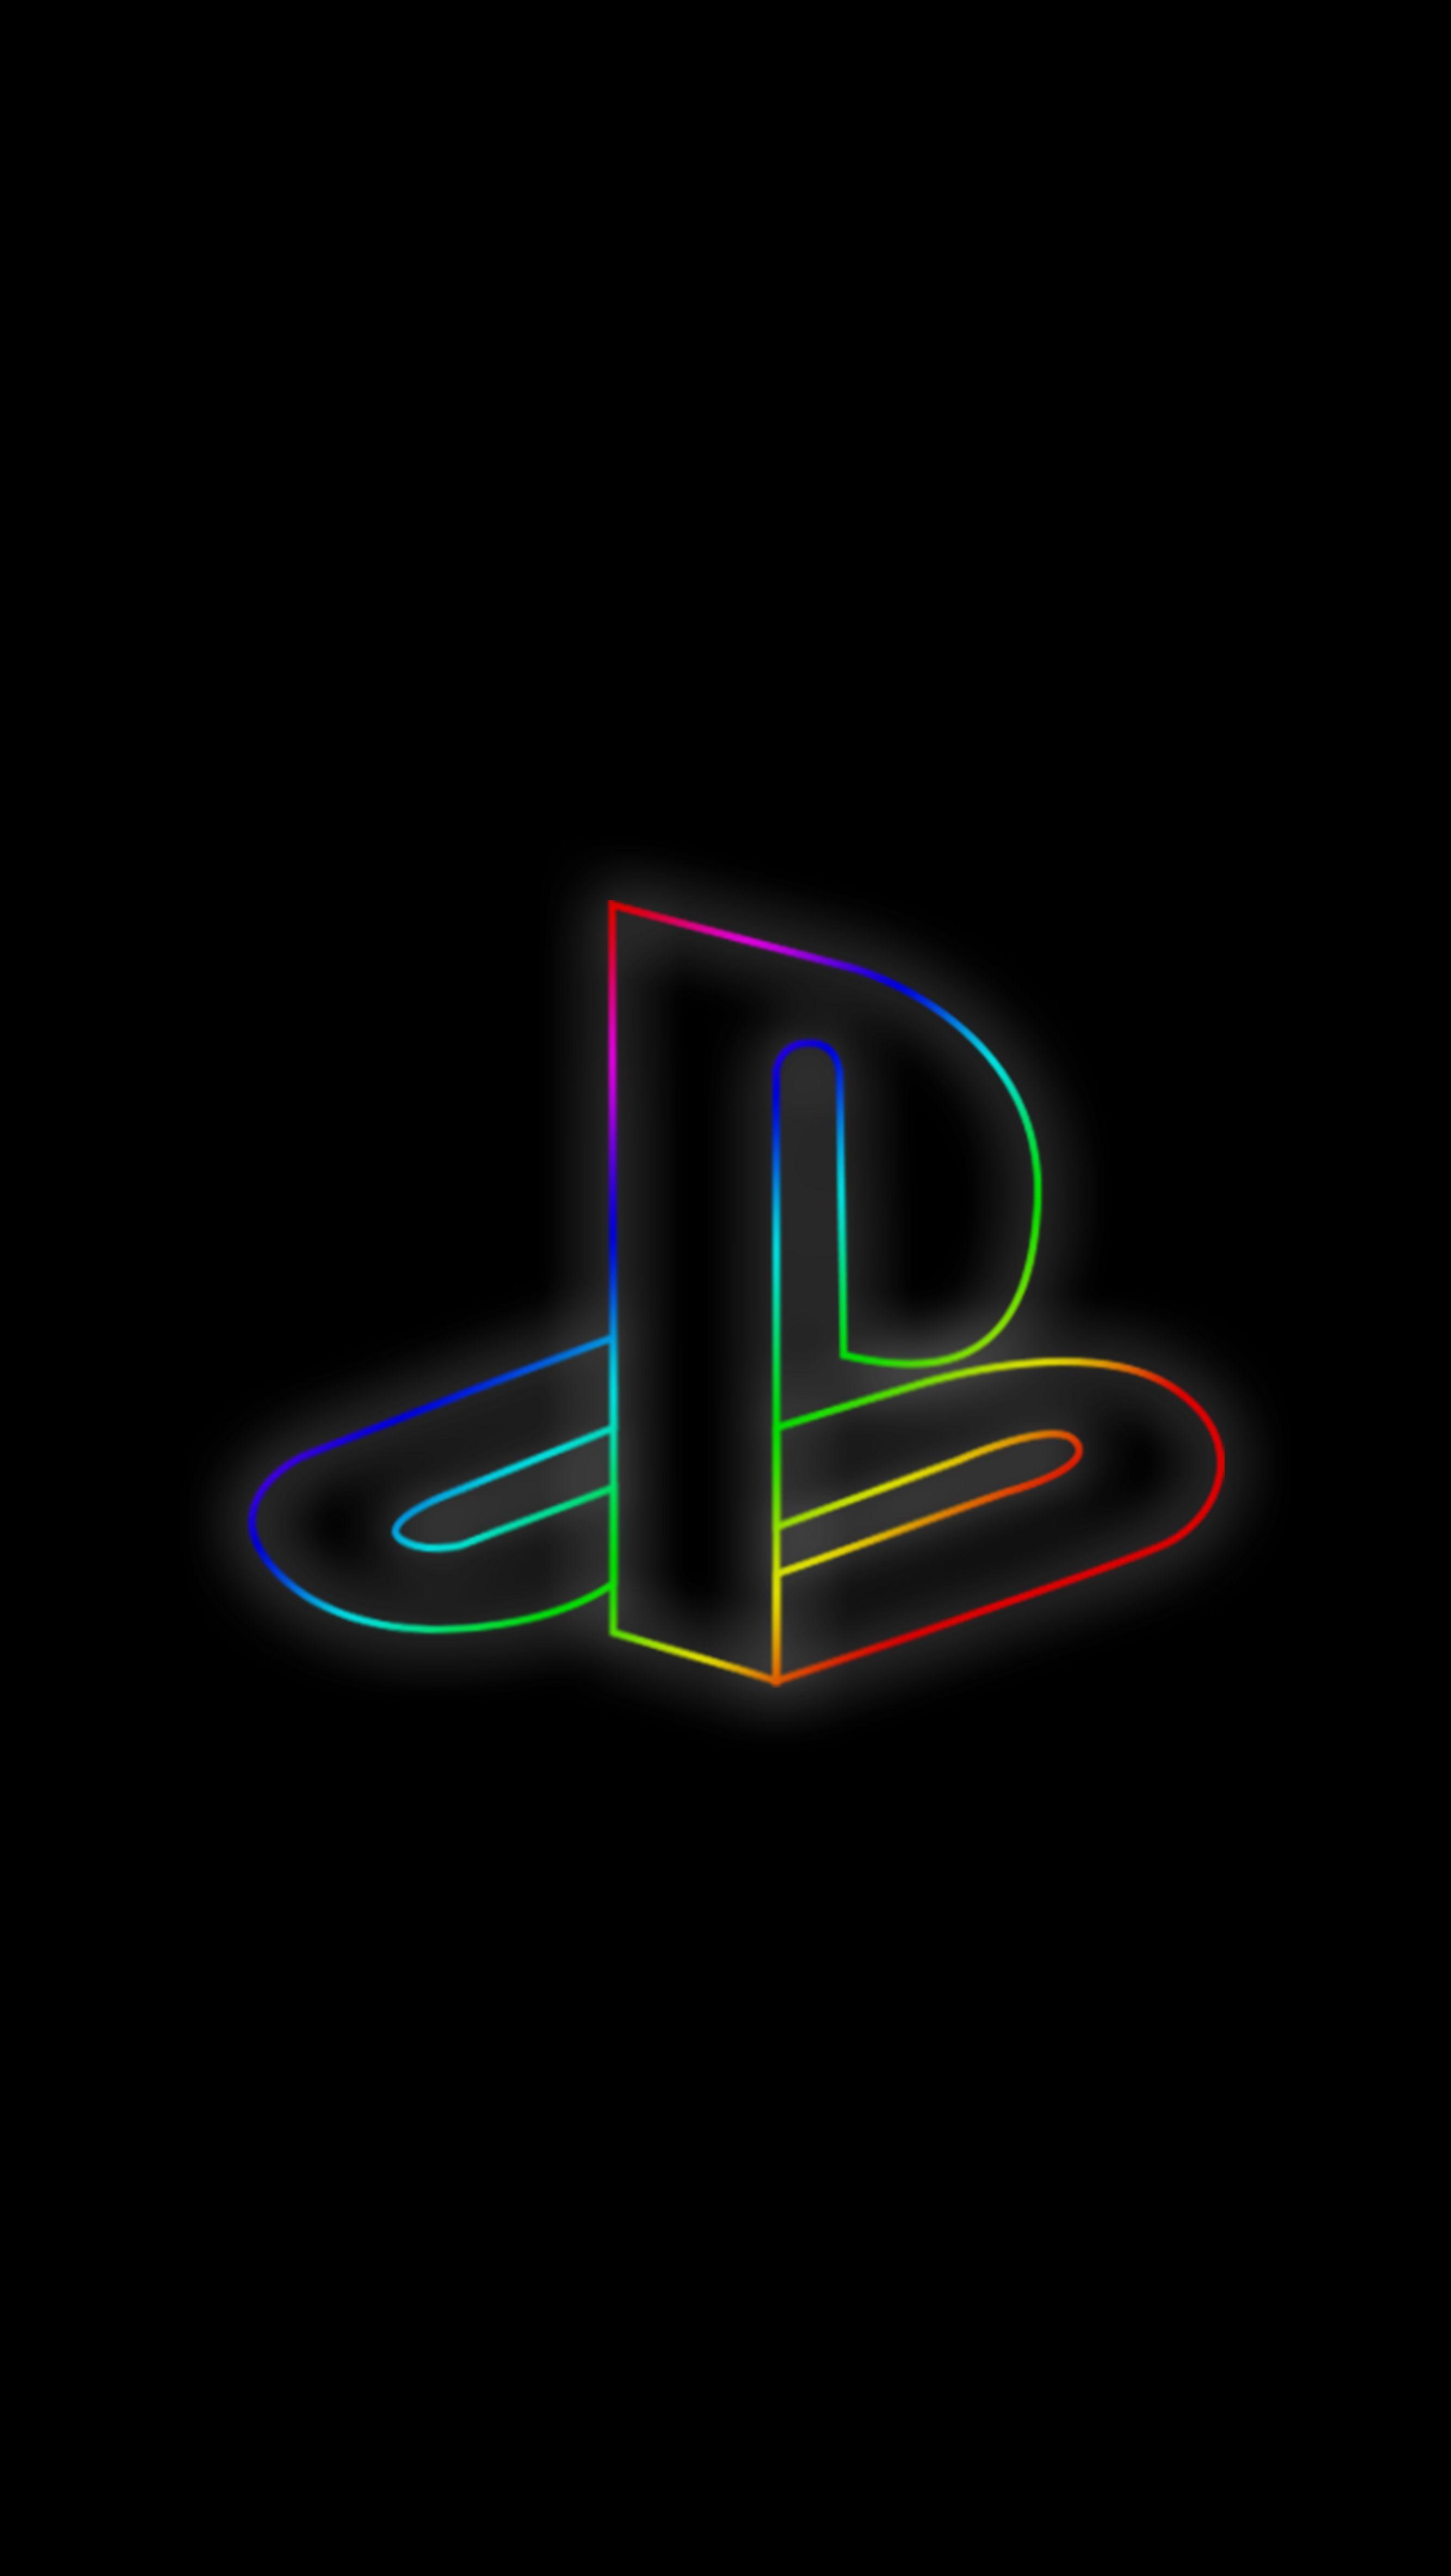 Neon Playstation Background Em 2020 Papeis De Parede De Jogos Papel De Parede Games Papeis De Parede Hd Celular